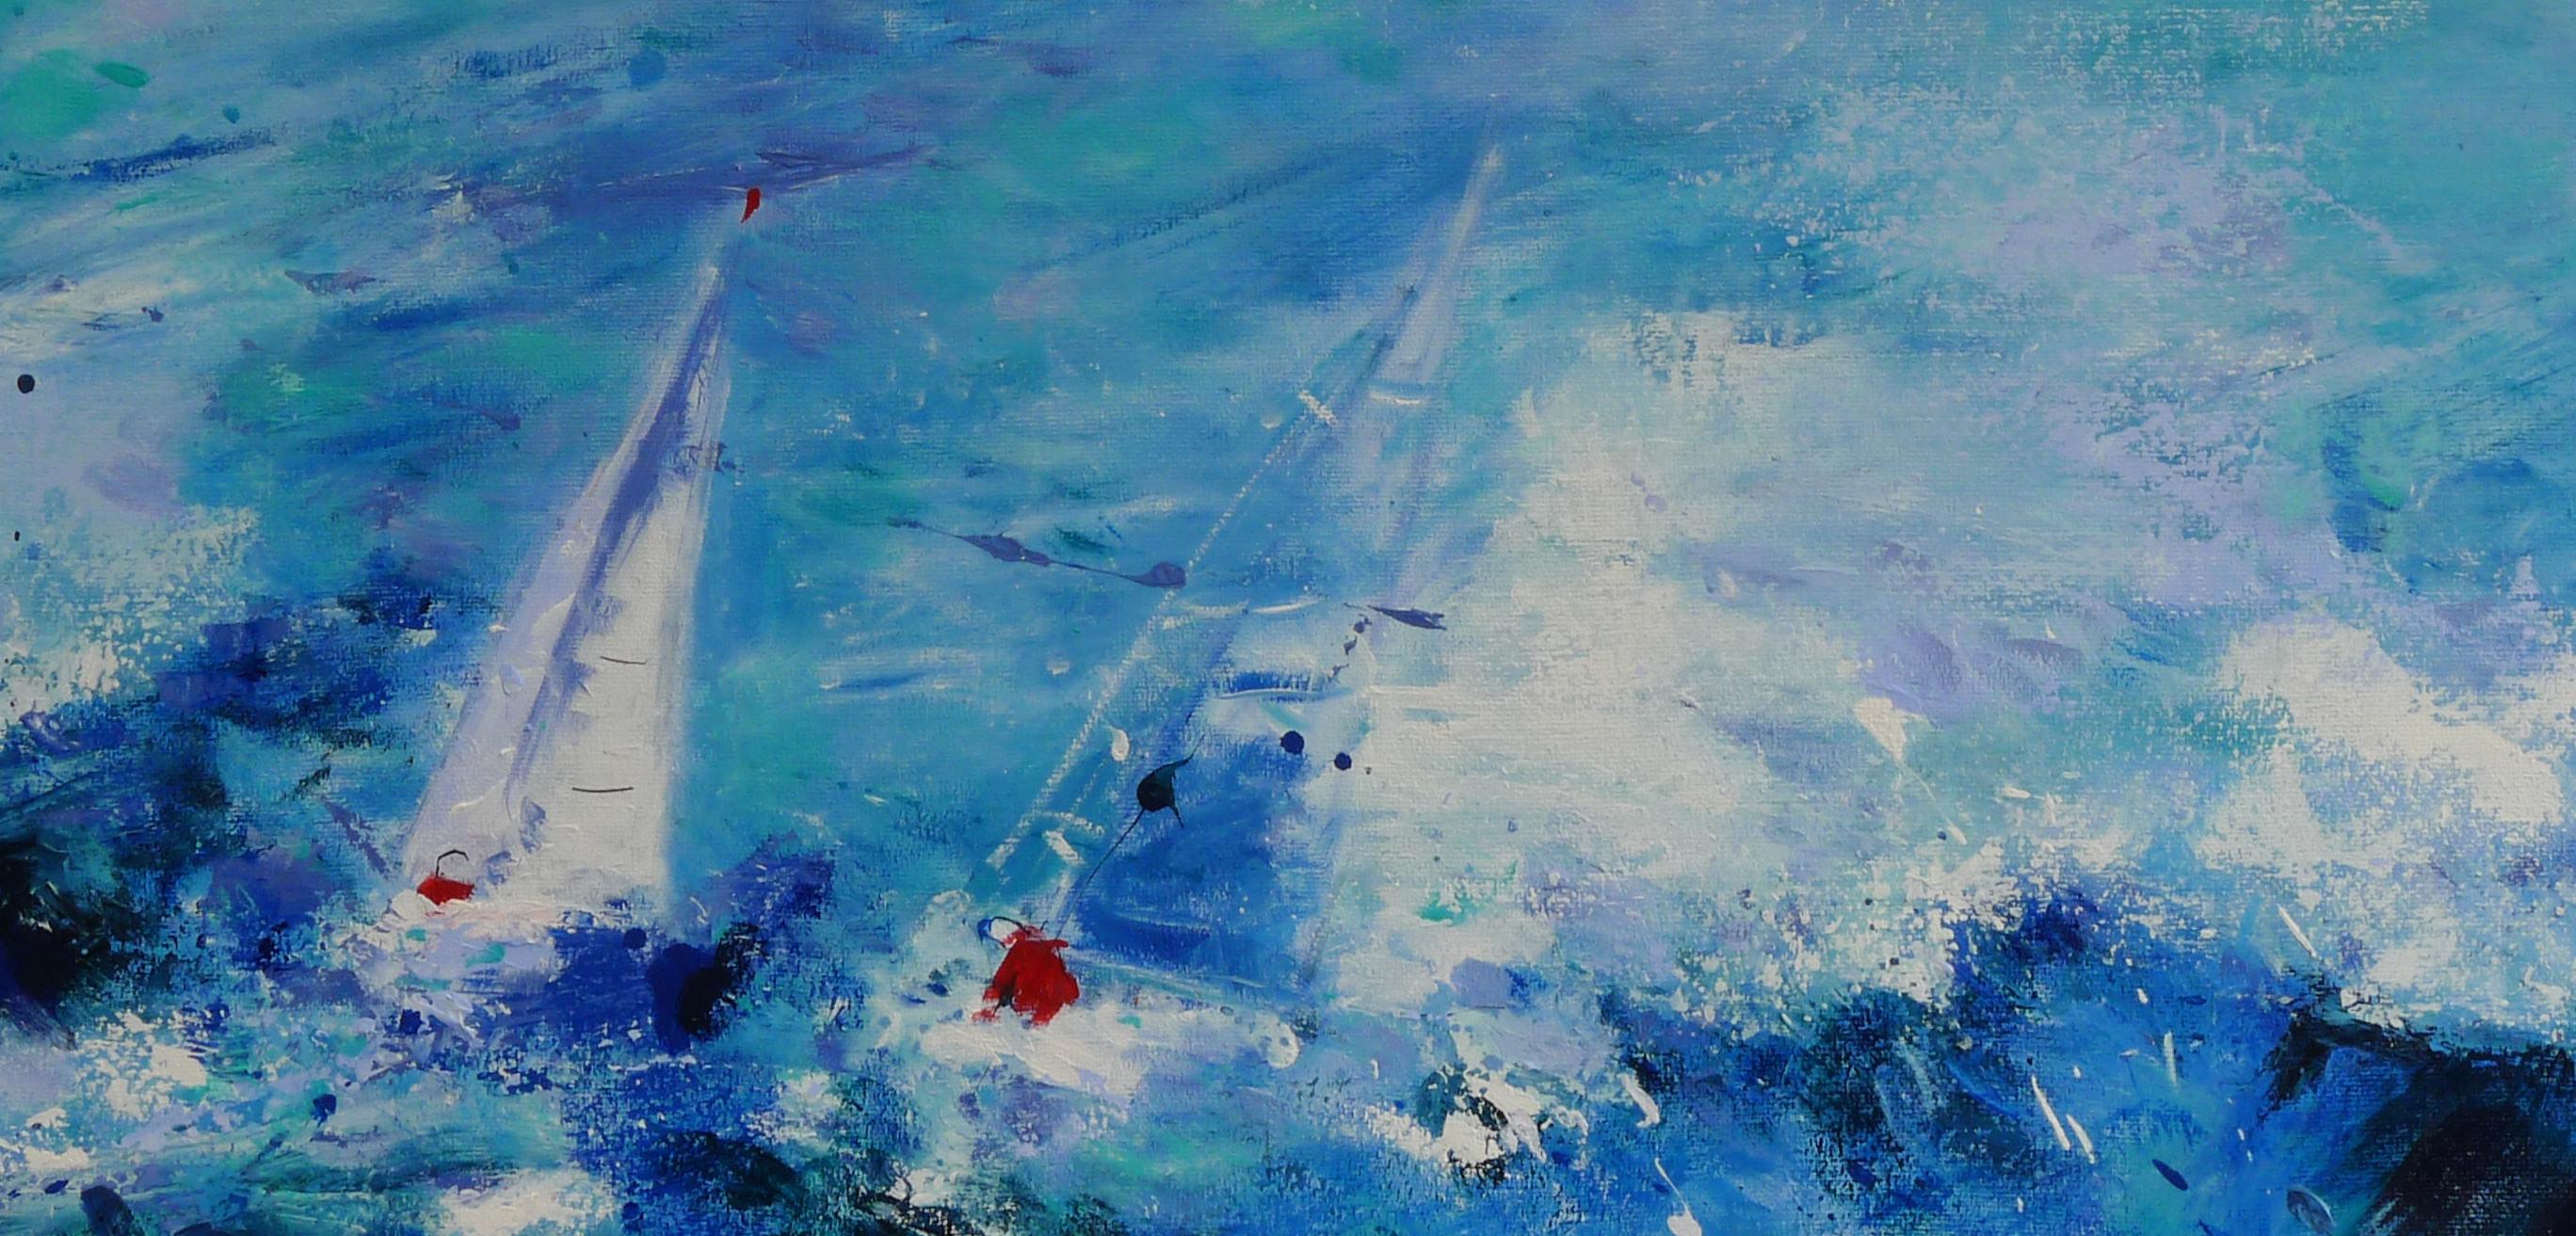 Ingrid-Dingjan-Sailing-at-full-sea-acryl-100x100-cm-.jpg2_-e1443621002436